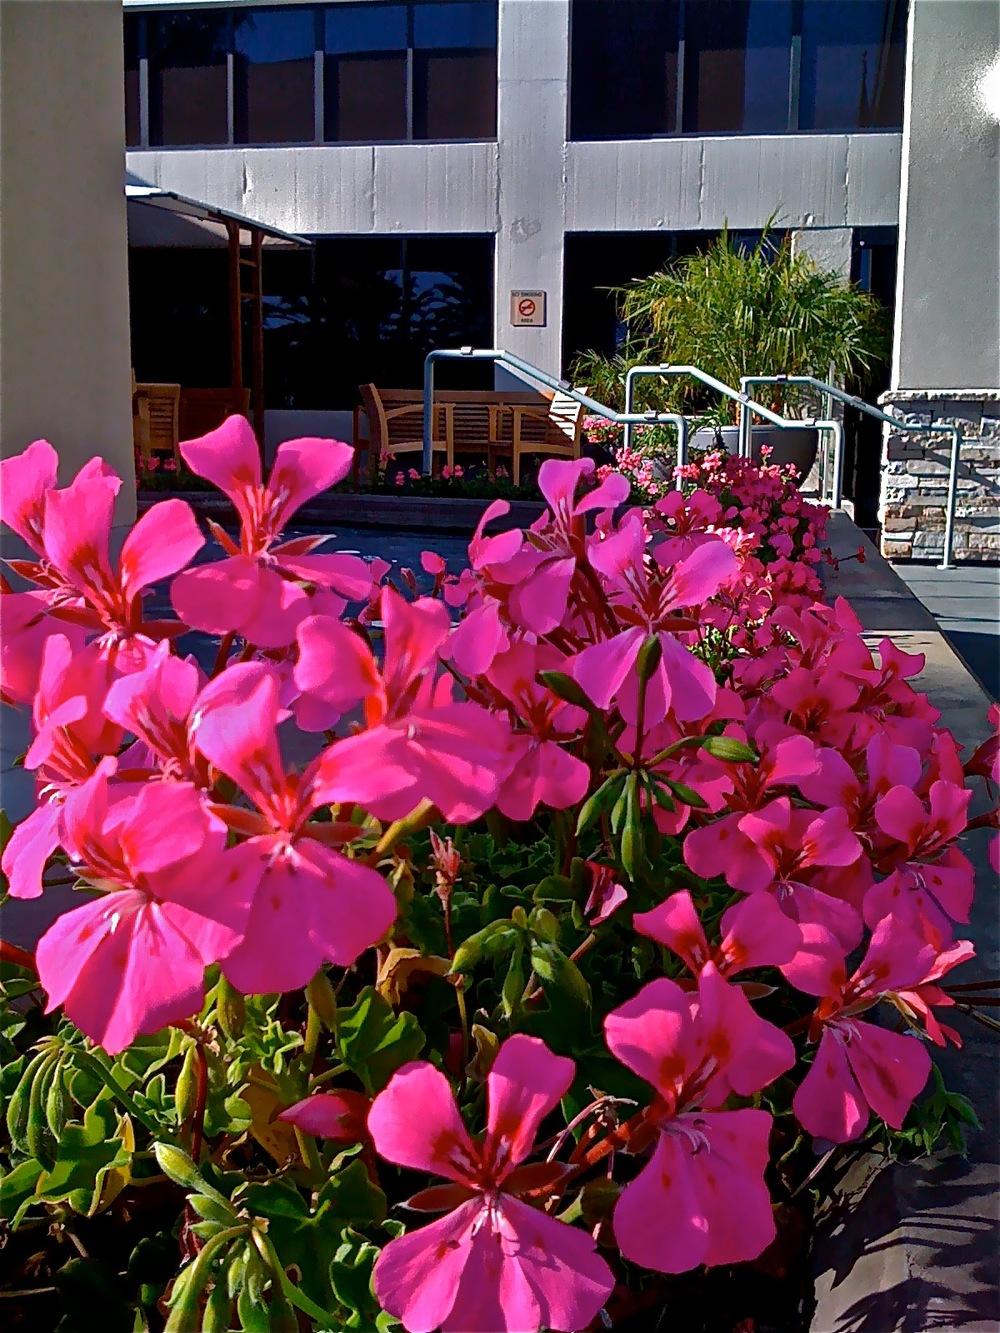 Saddleback Hospital, Mission Viejo, CA